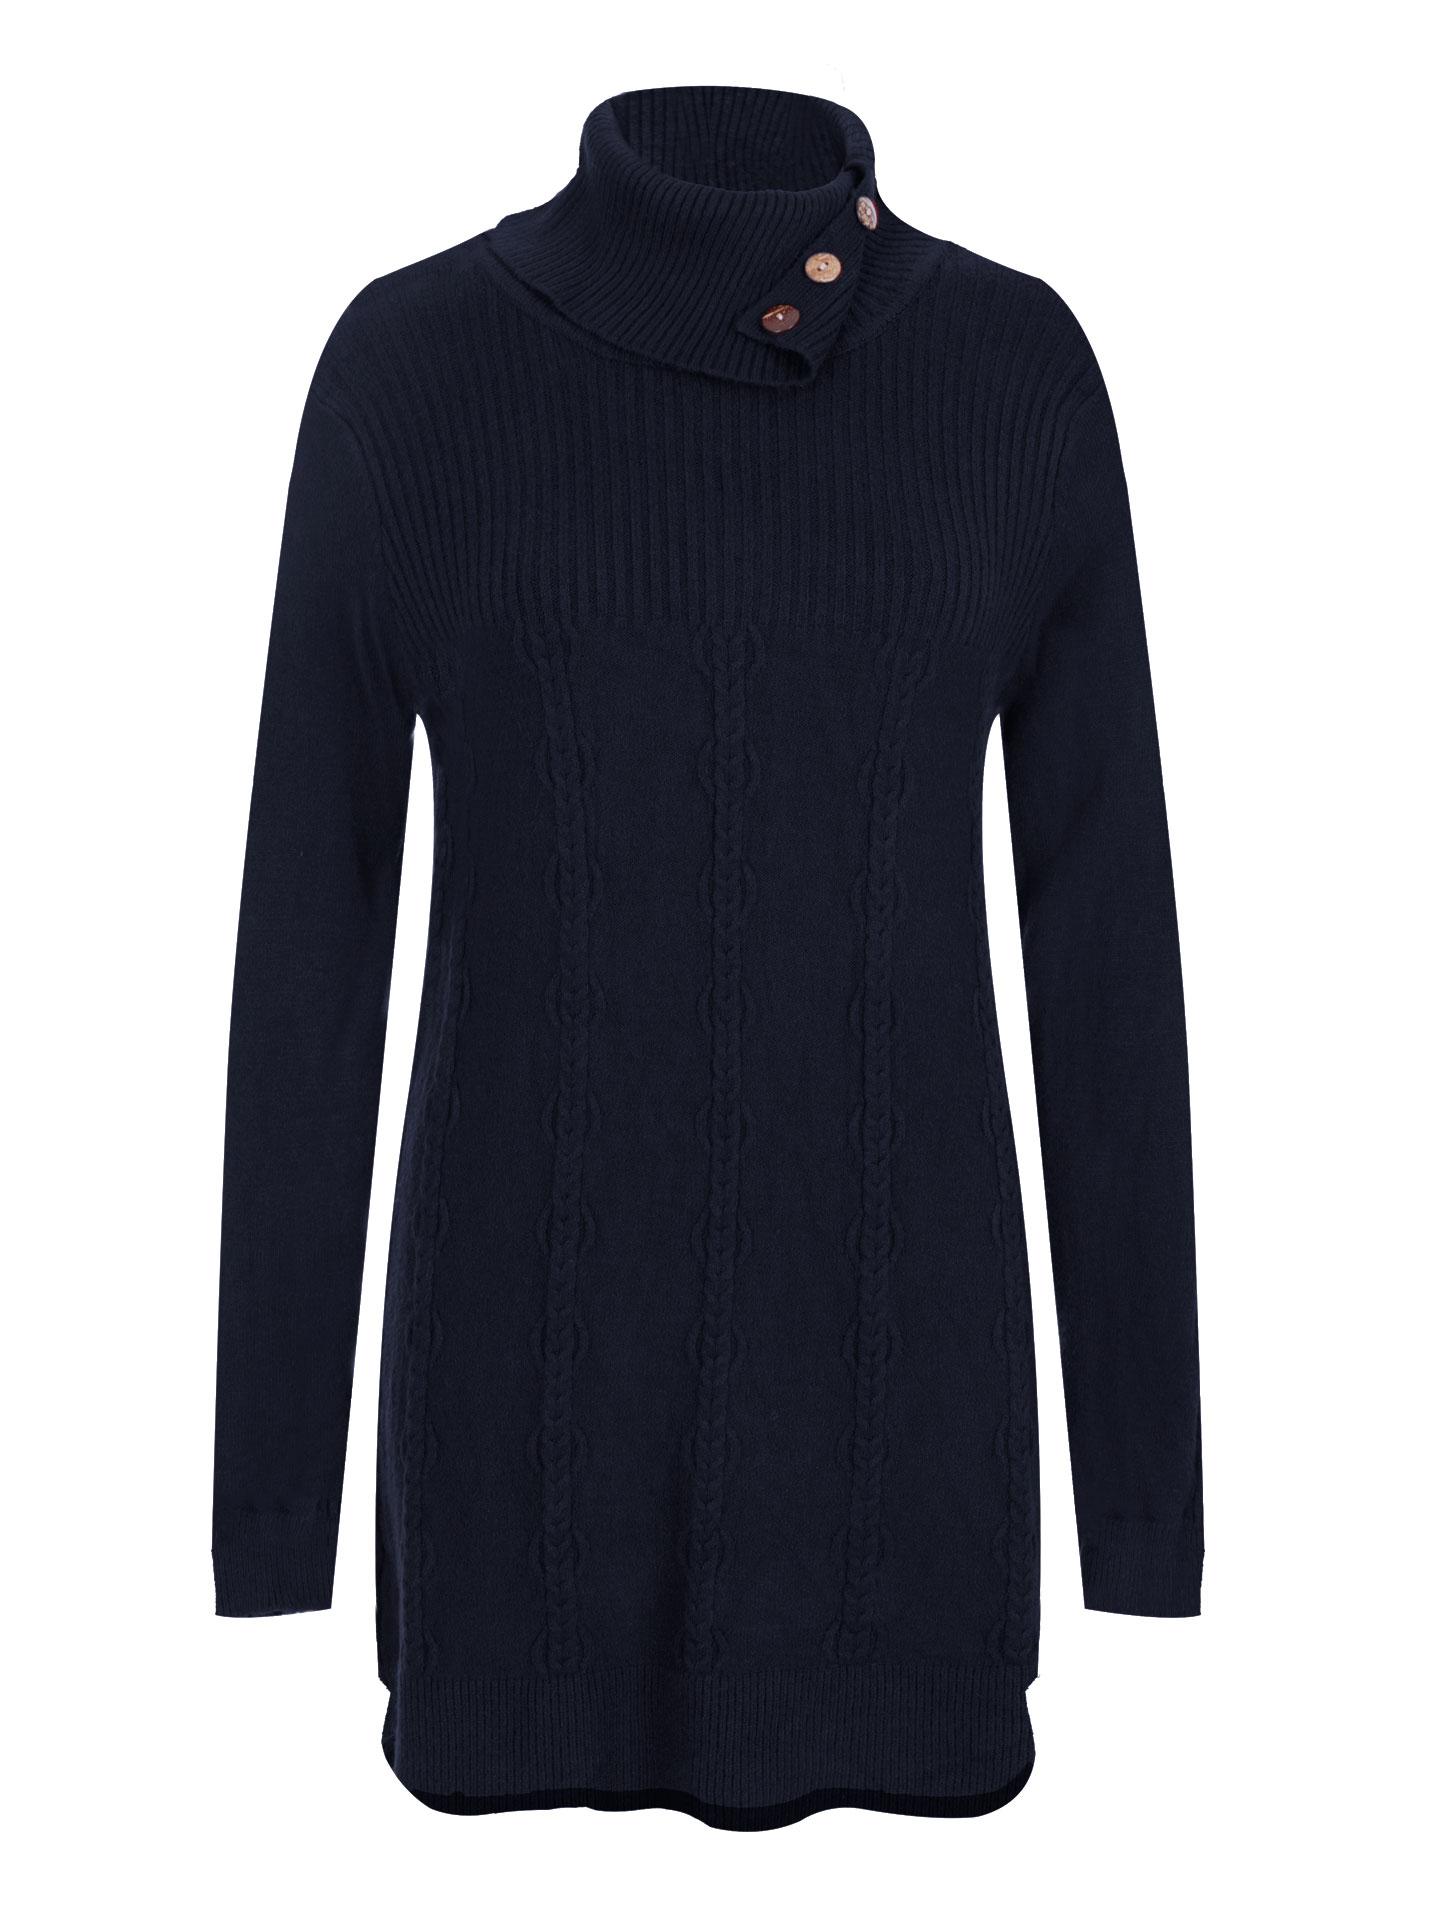 679ea3592237 Μακρύ πουλόβερ με κουμπιά σε σκουρο μπλε